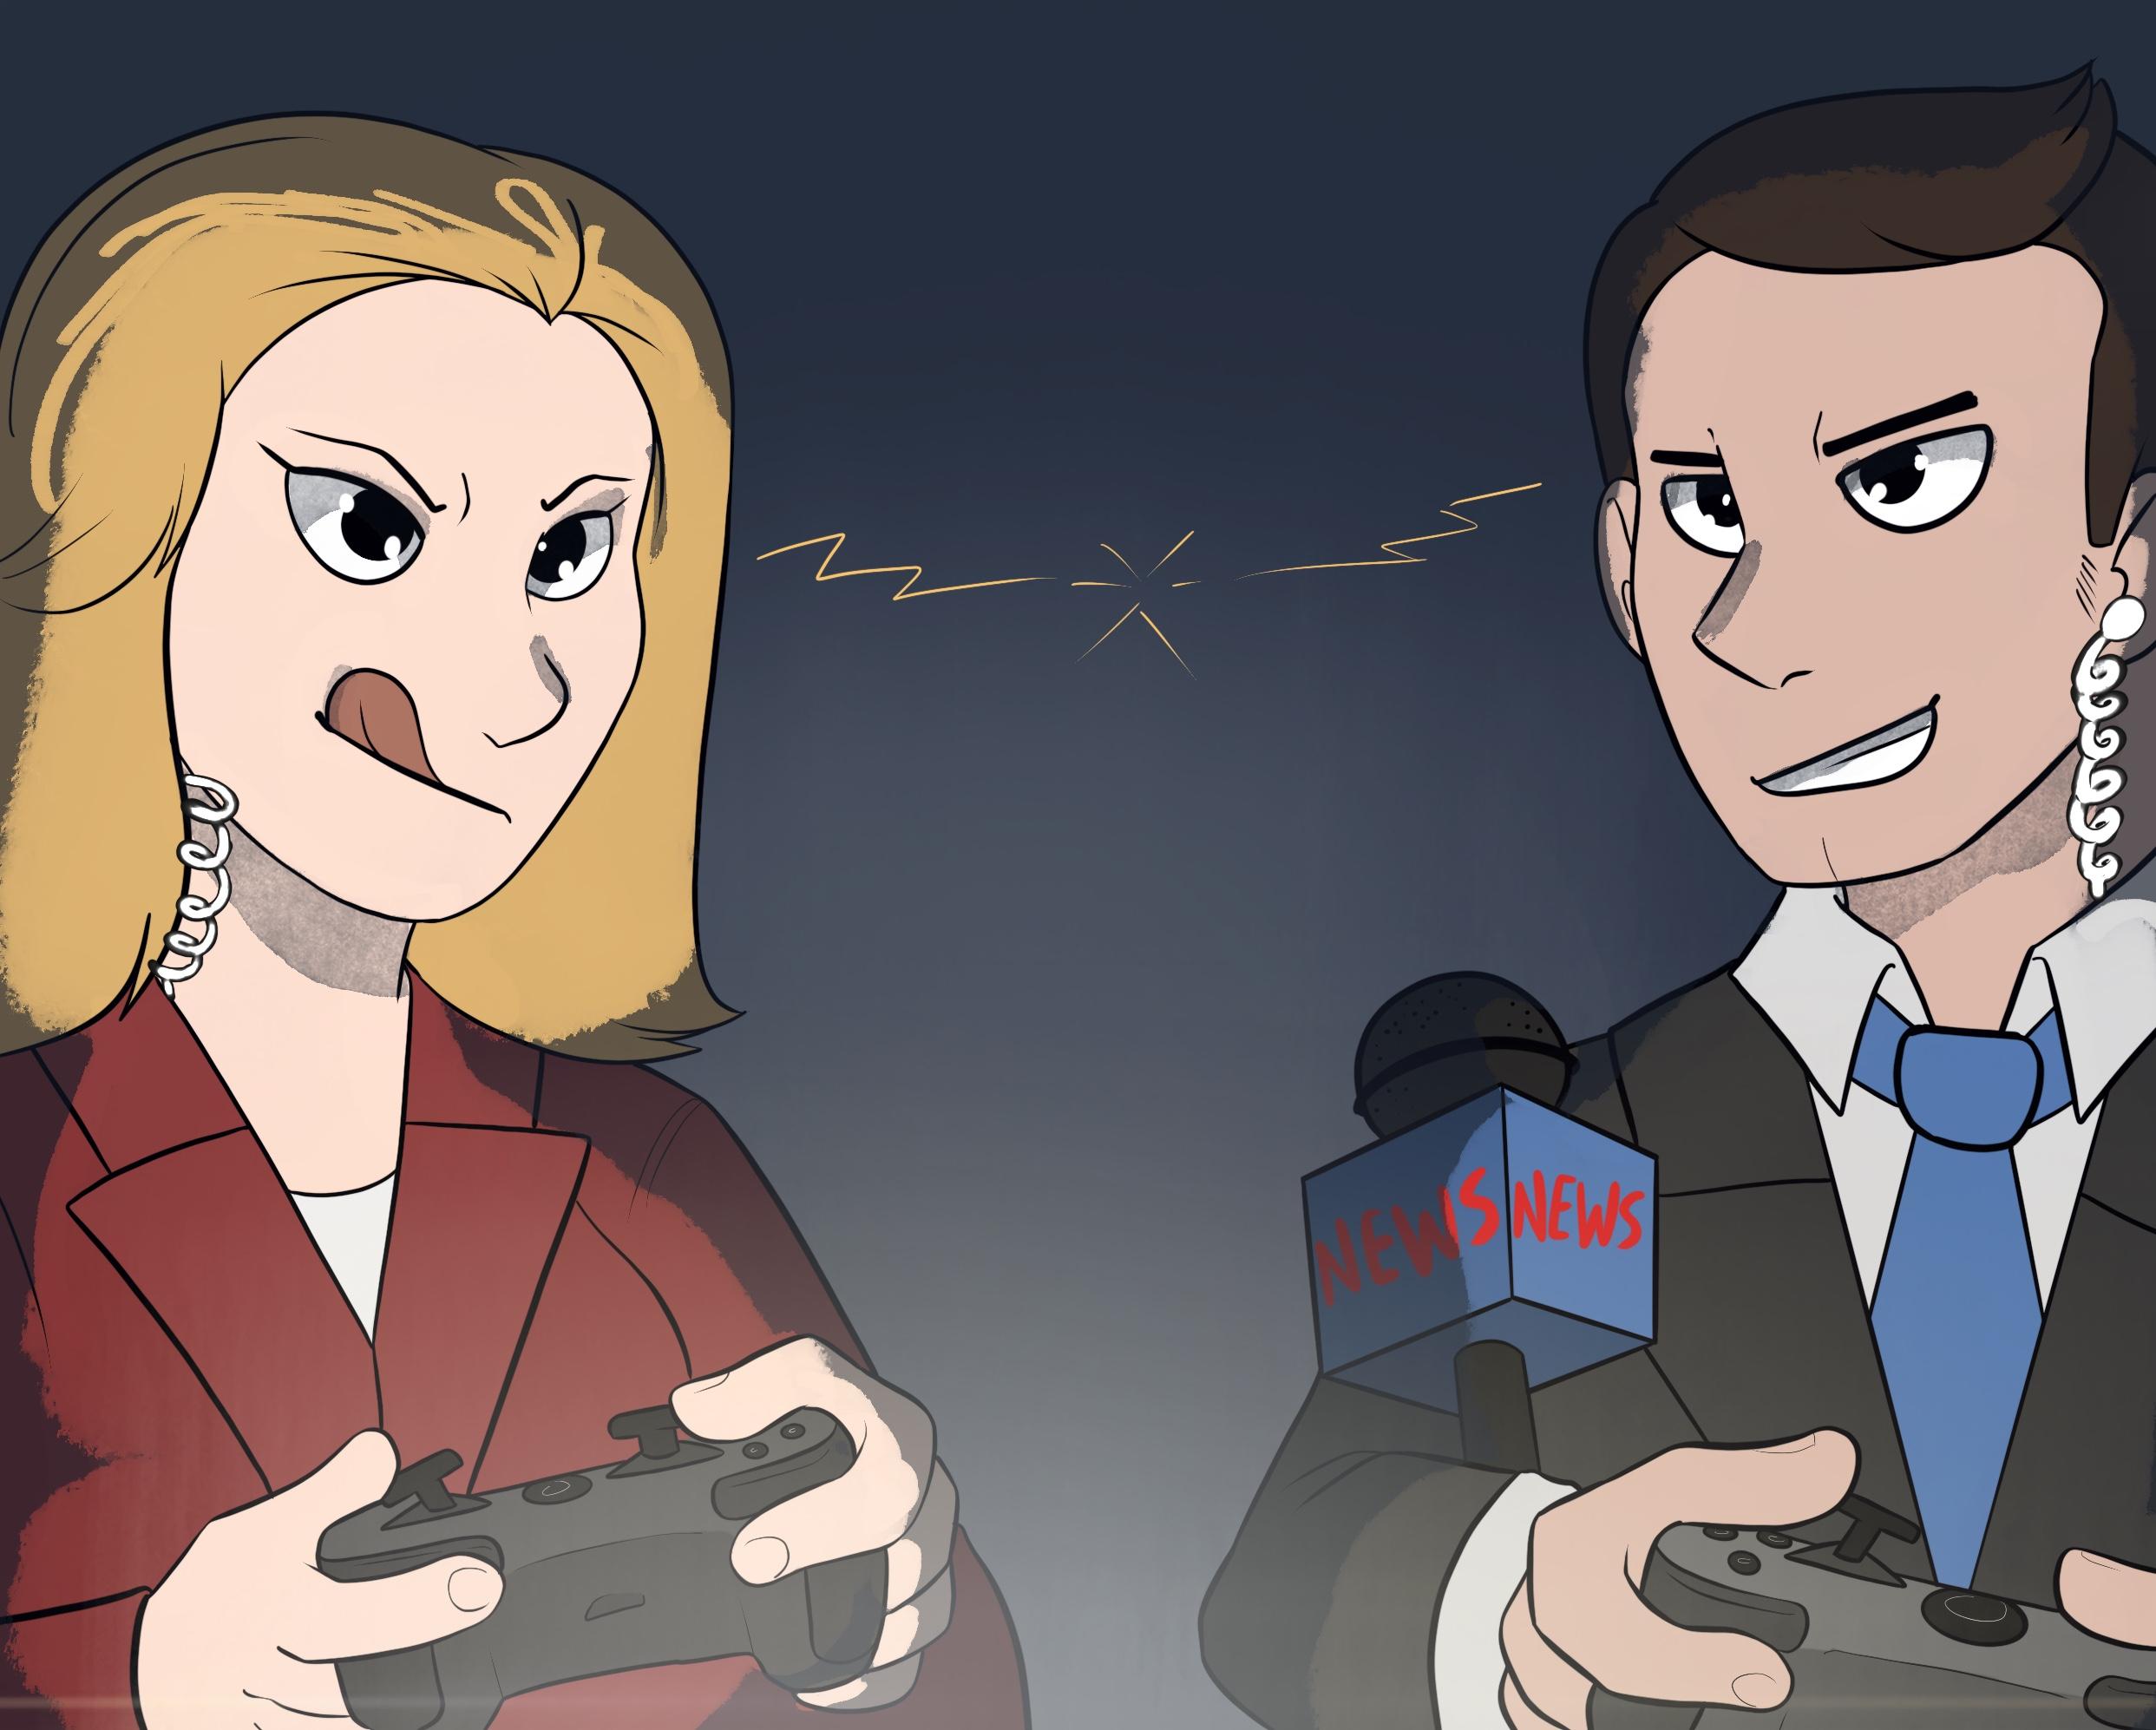 Top 5 video games to get you through COVID-19 quarantine